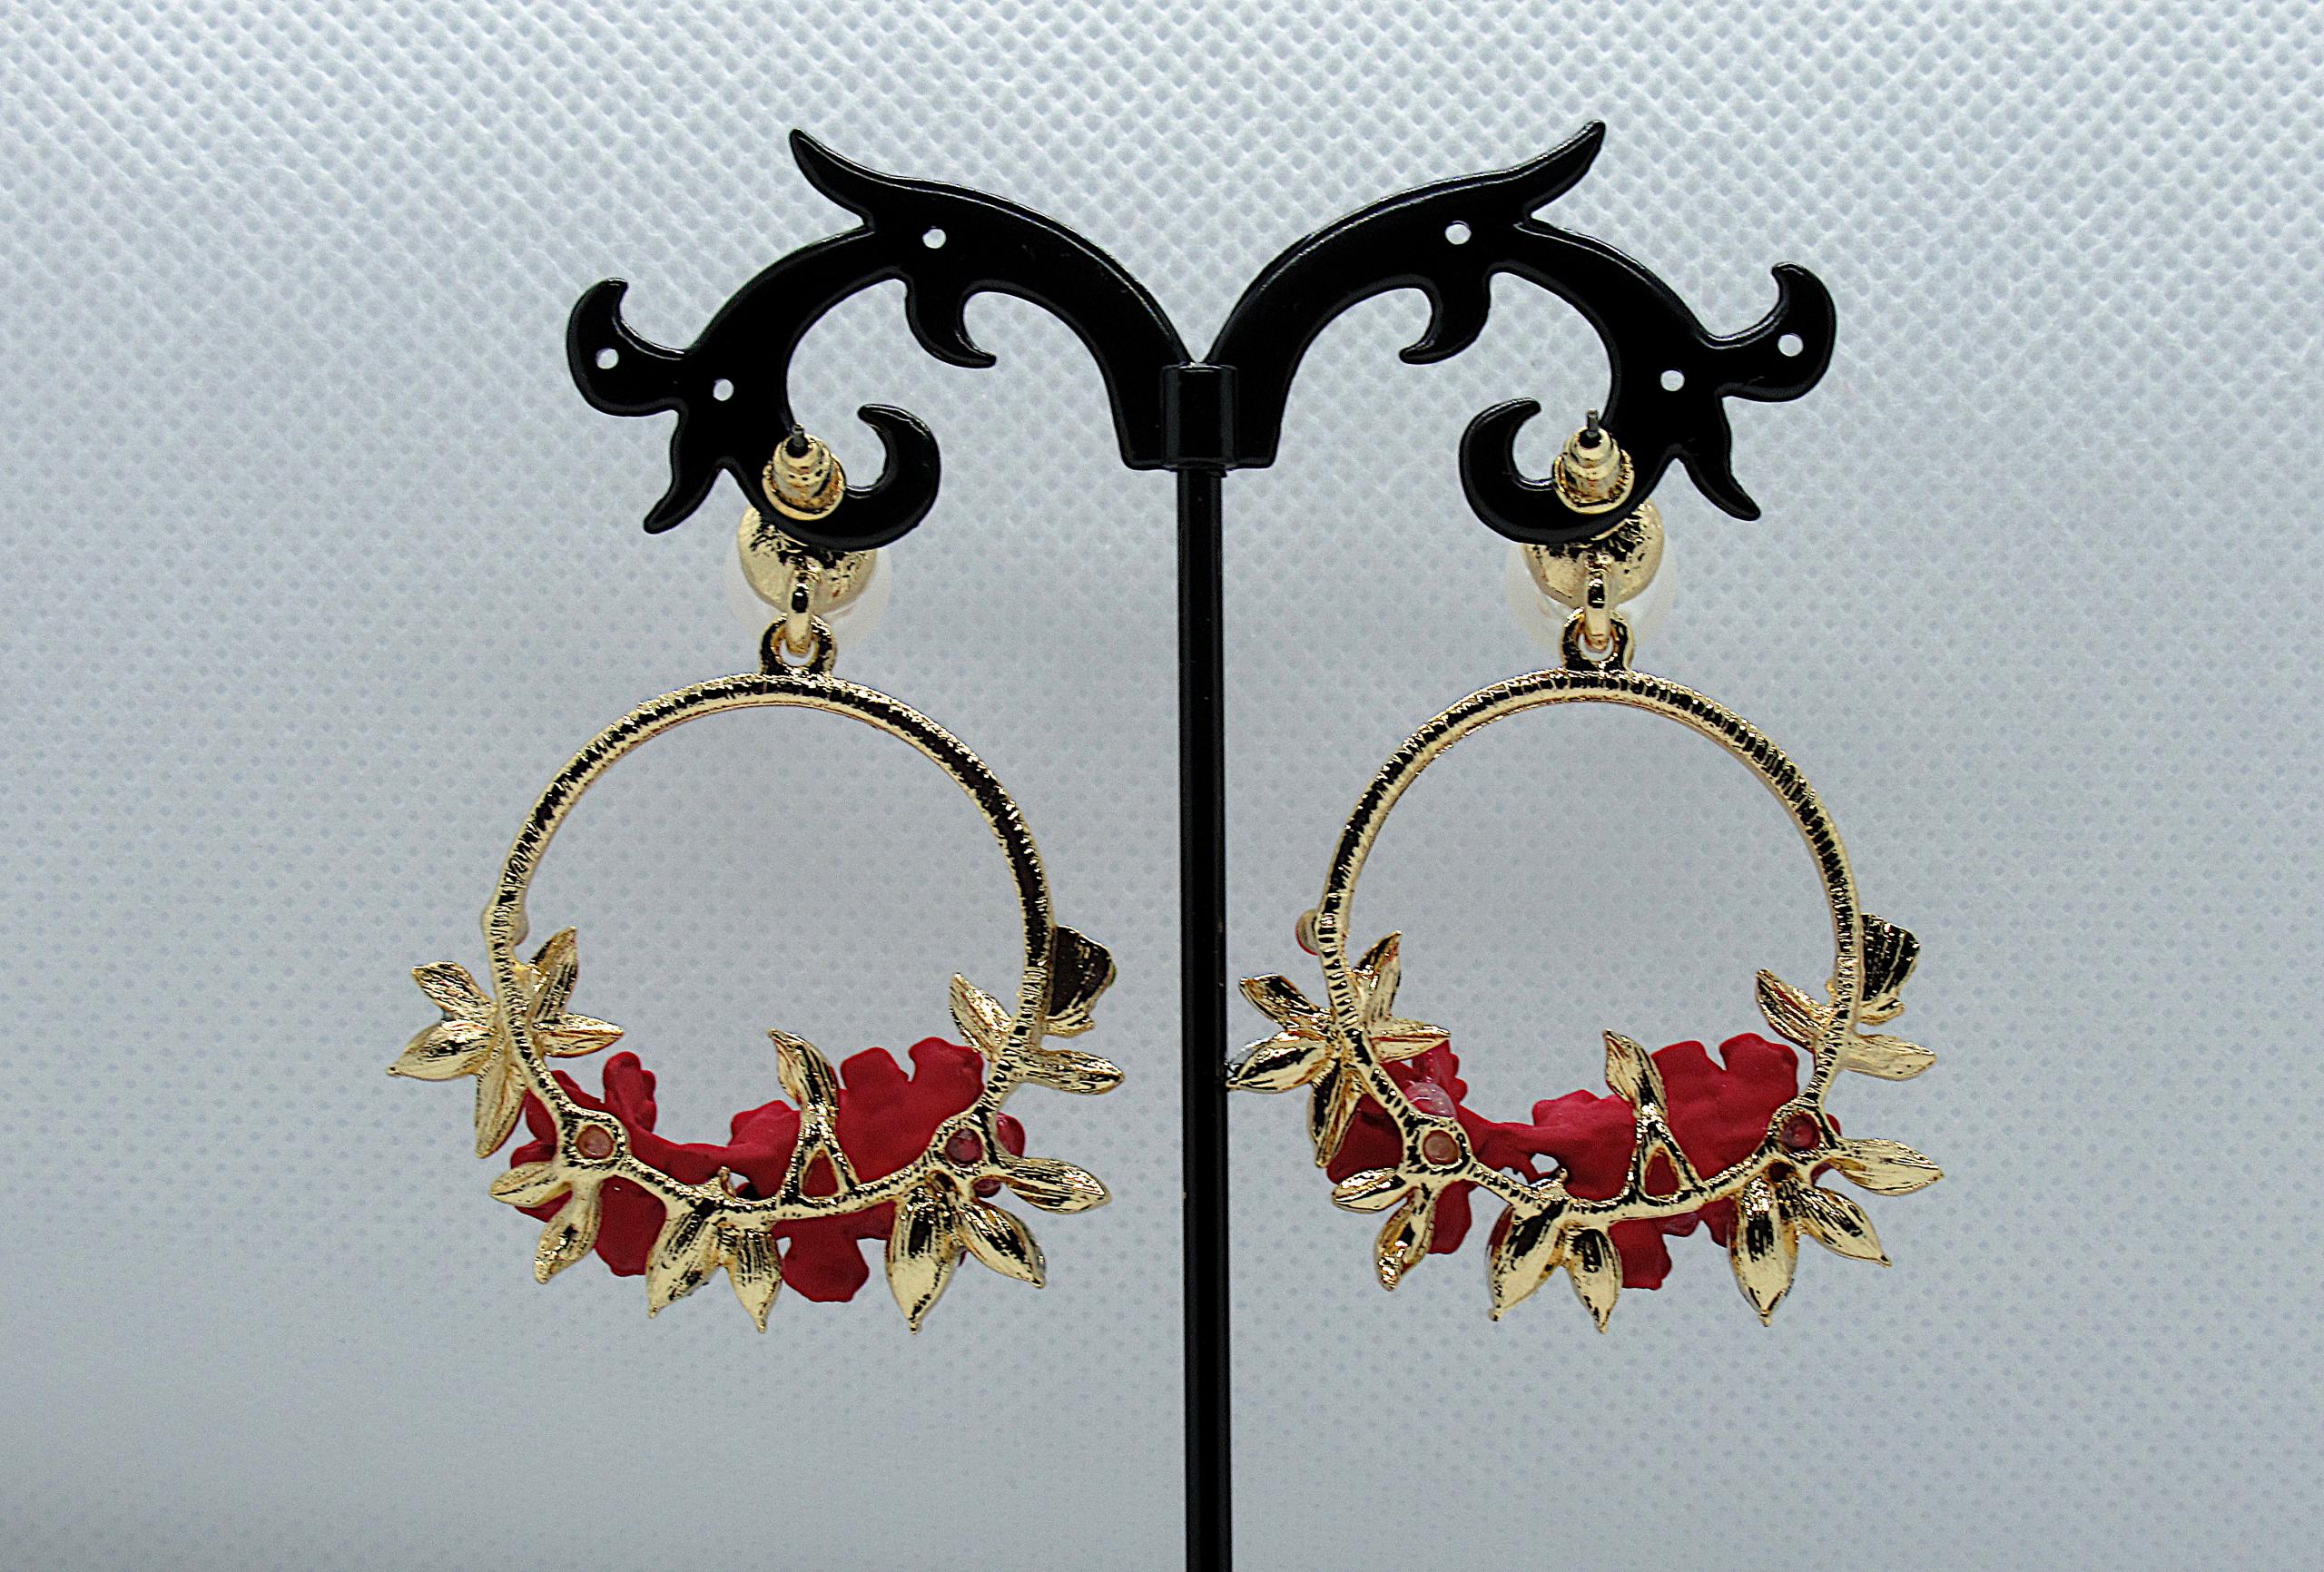 PA-302_Crystal and Pearl Floral Wreath Hoop Earrings-Red-back